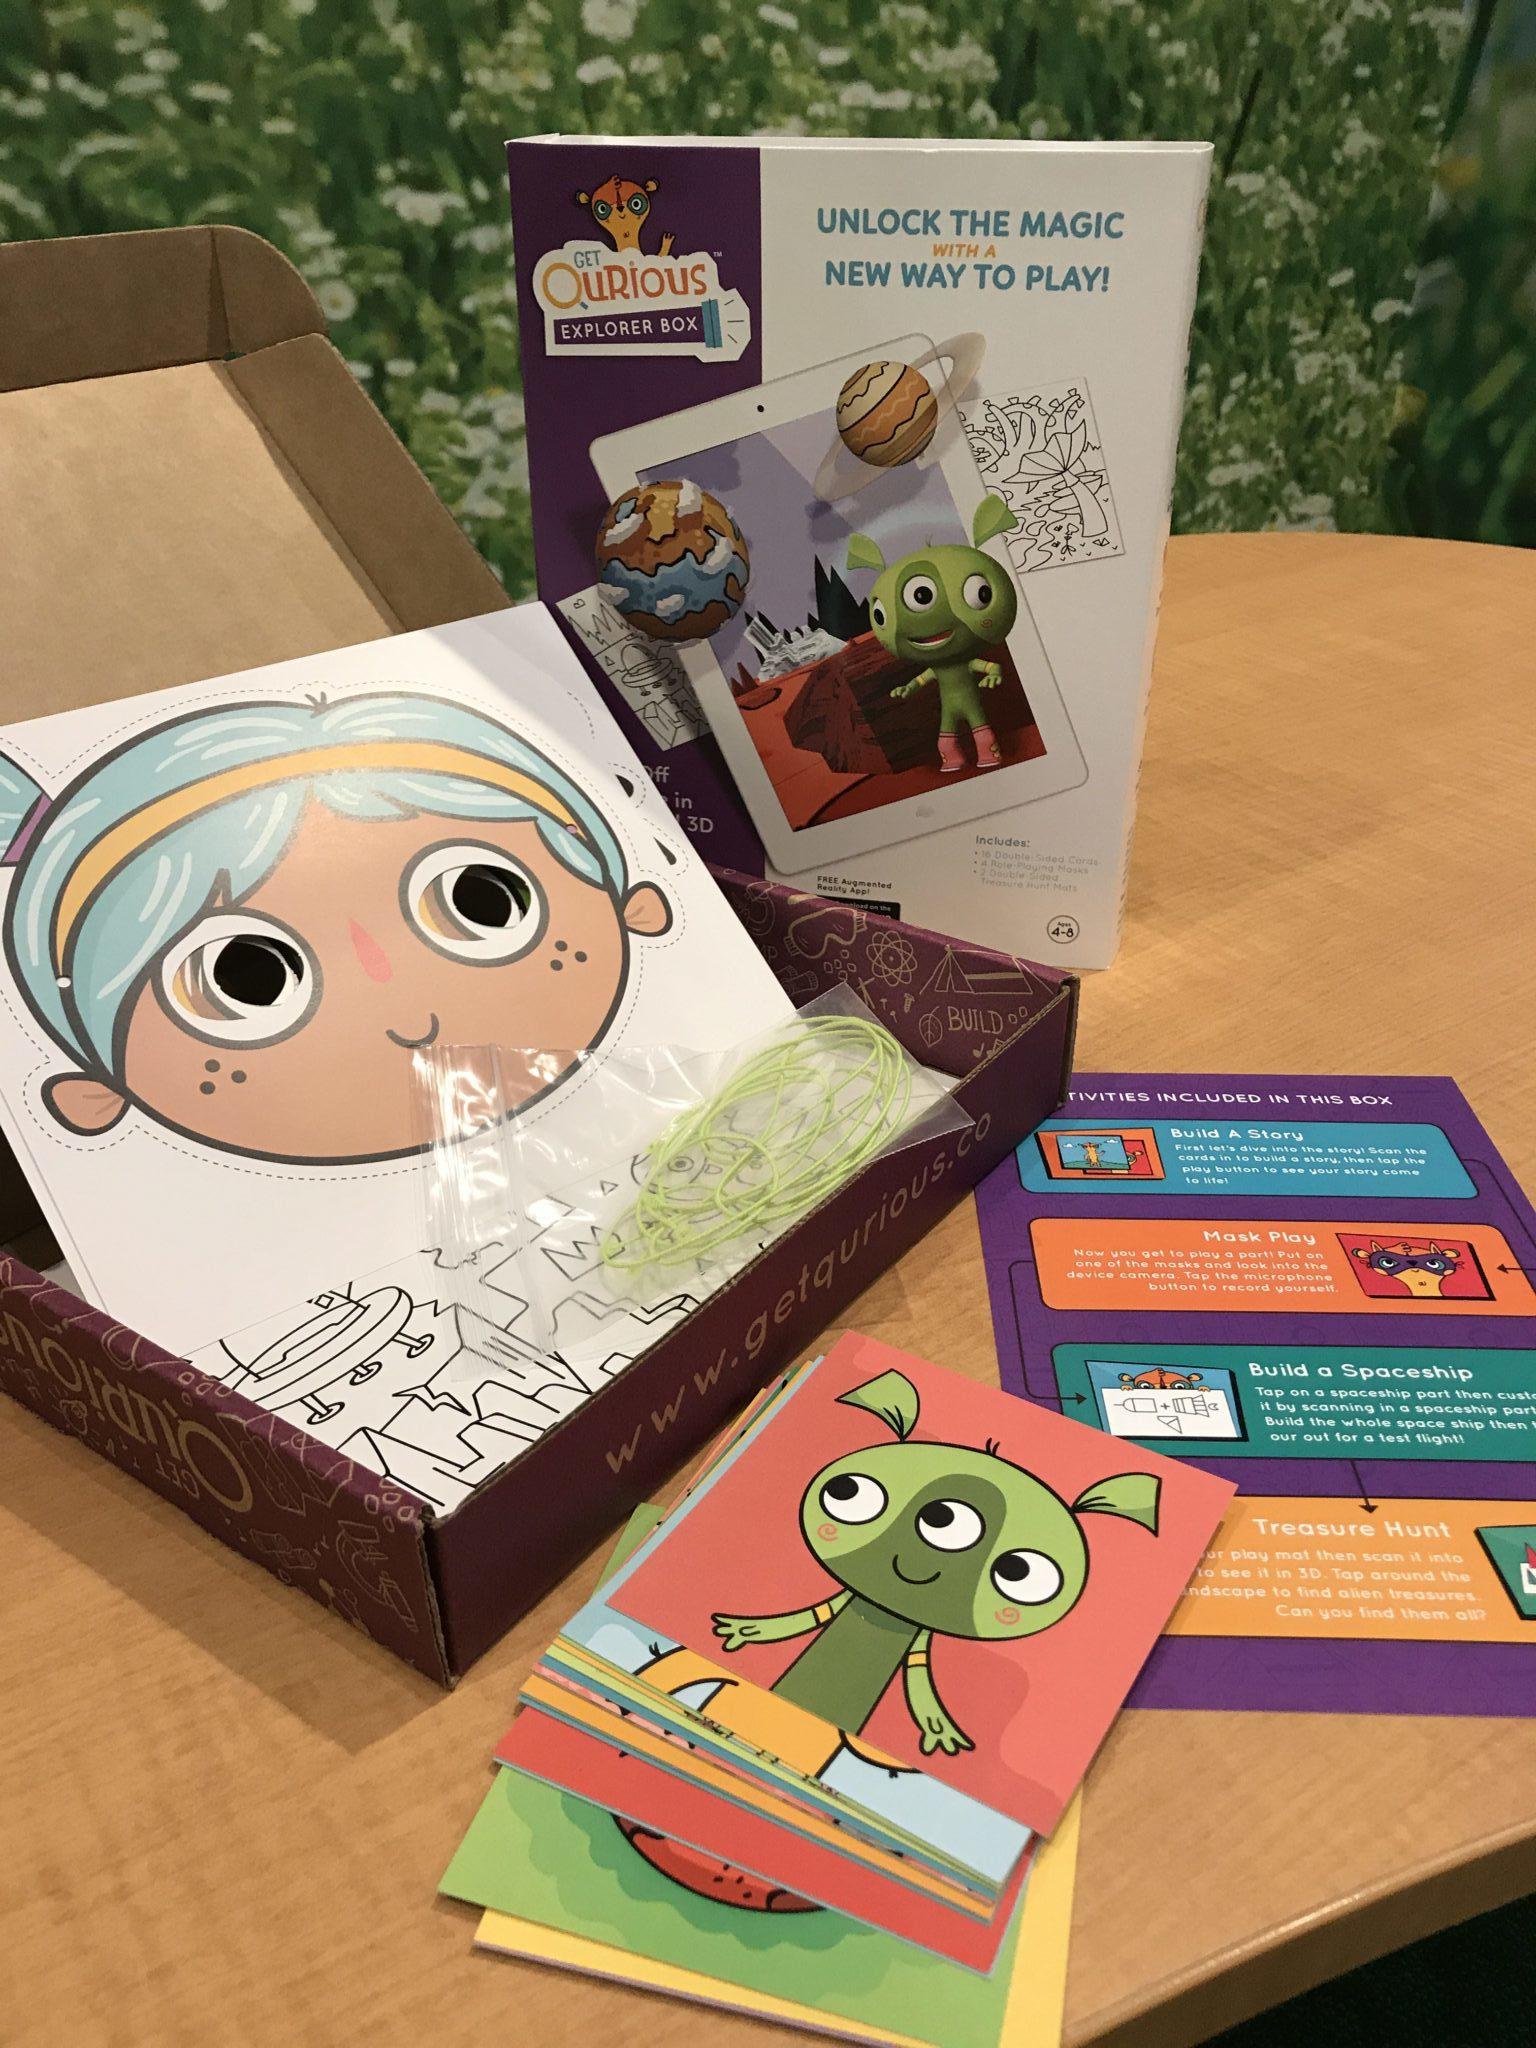 Get Qurious Science Explorer Box